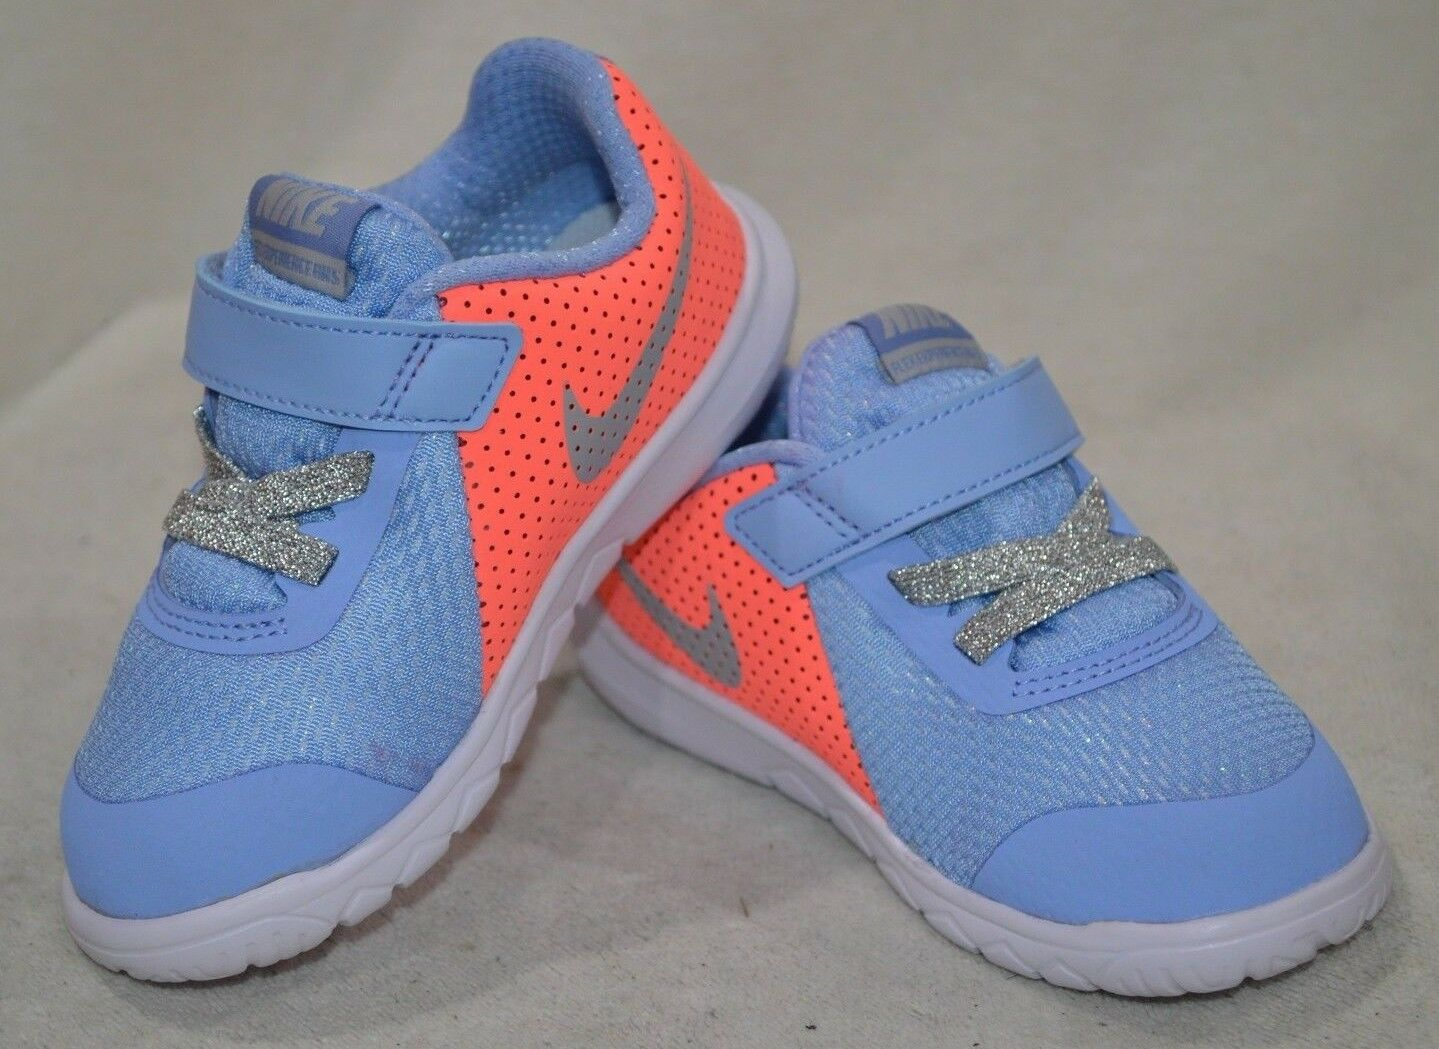 013ac122c59ed Nike Flex Experience 5 SE GTV Aluminun platinum Toddler Girl s Shoes ...